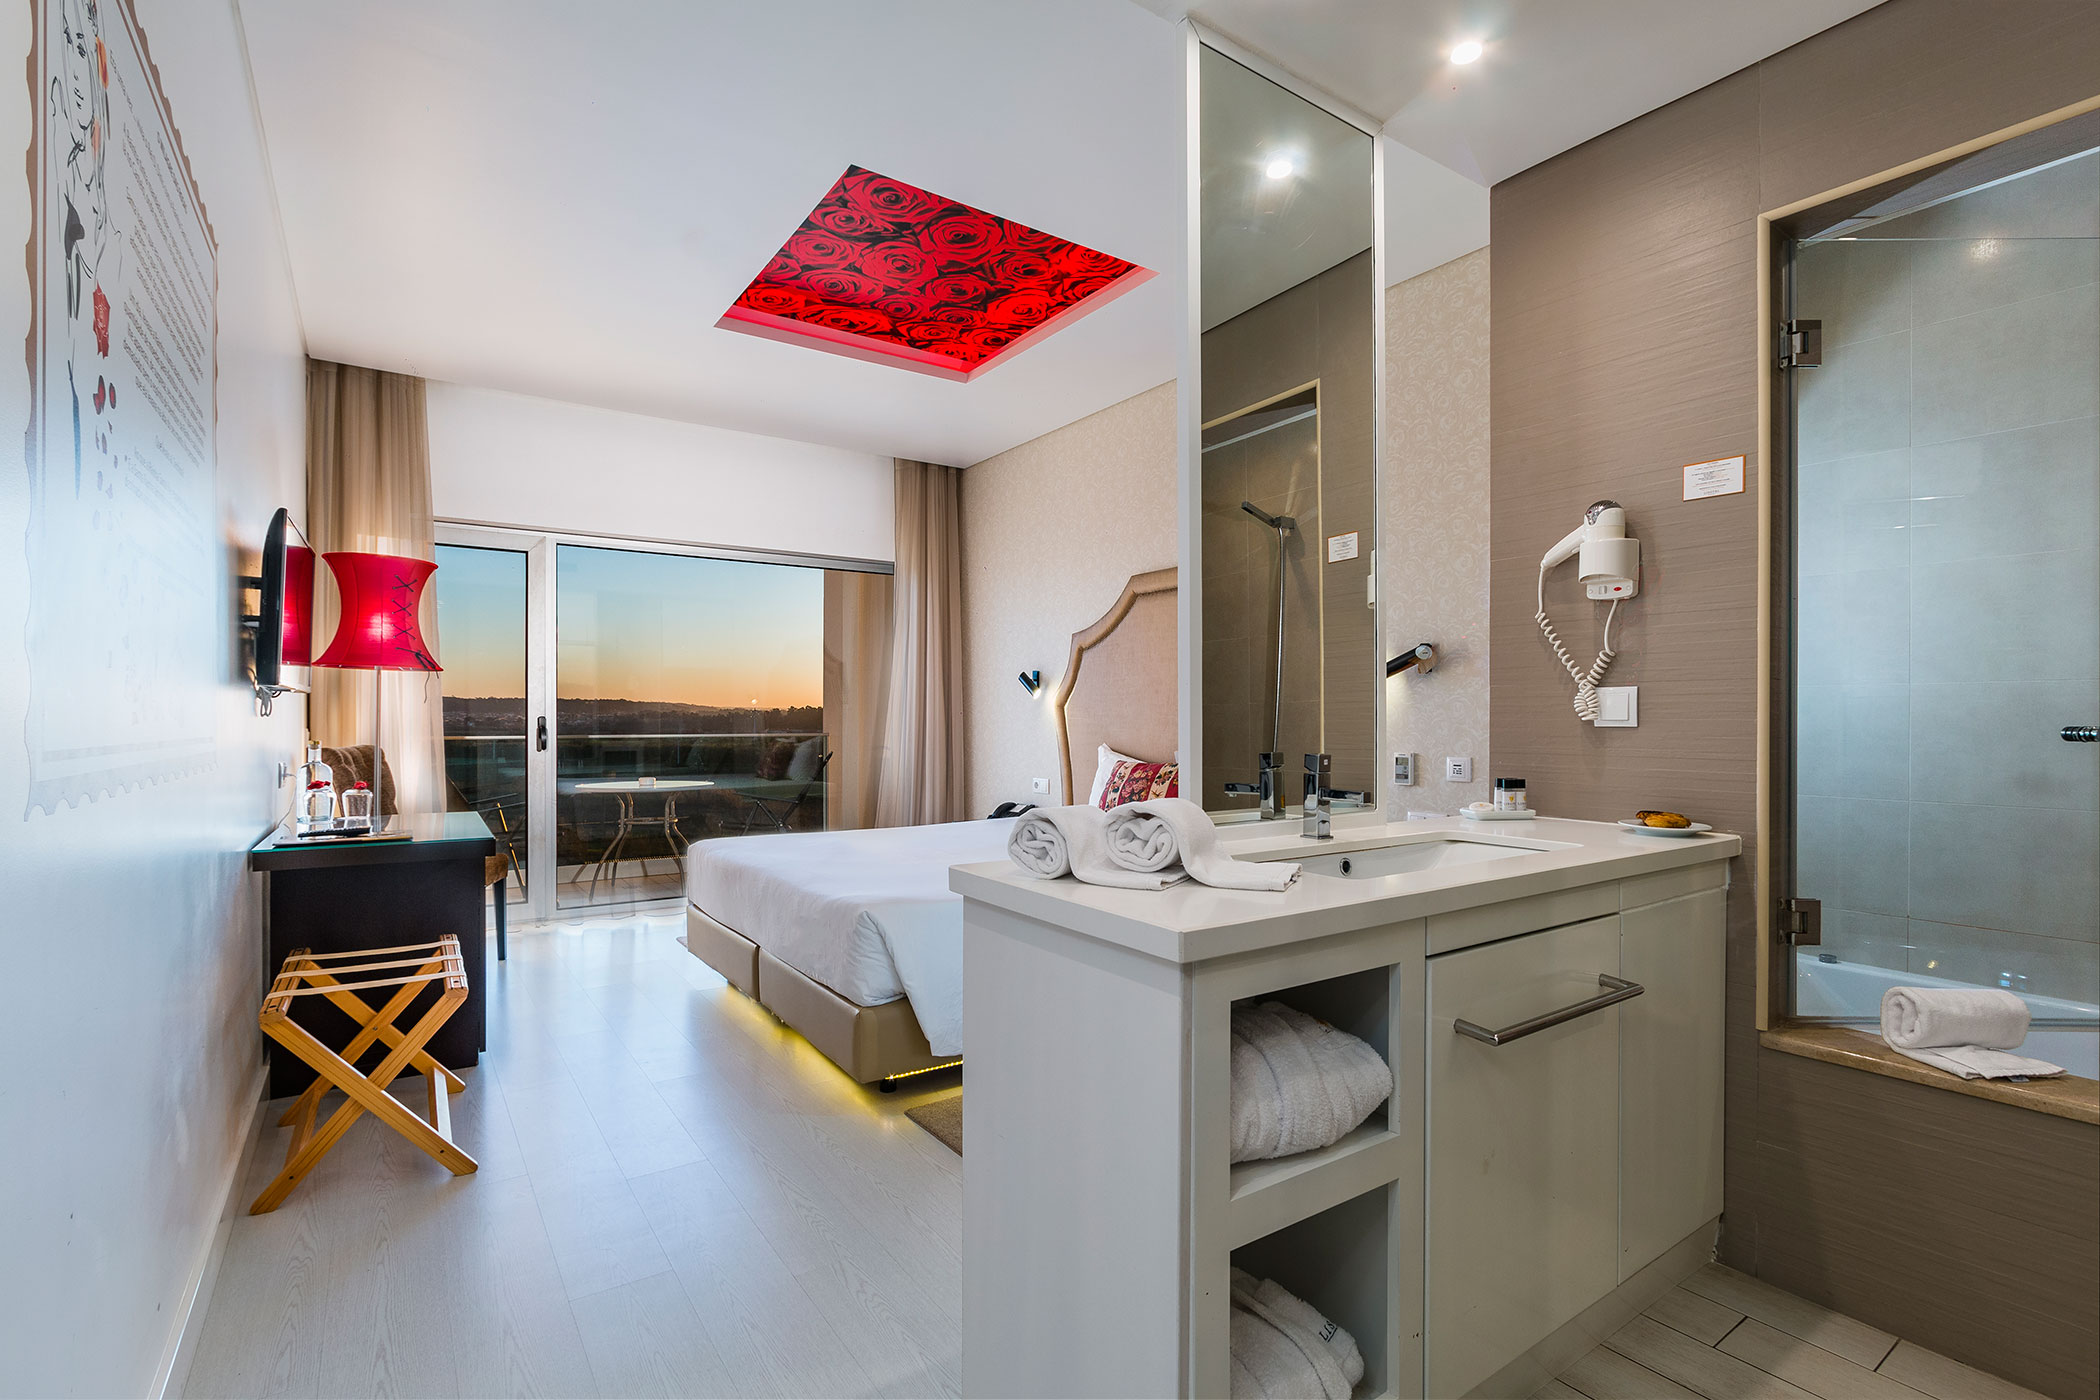 Quarto Standard Milagre das Rosas - Lisotel Hotel e Spa